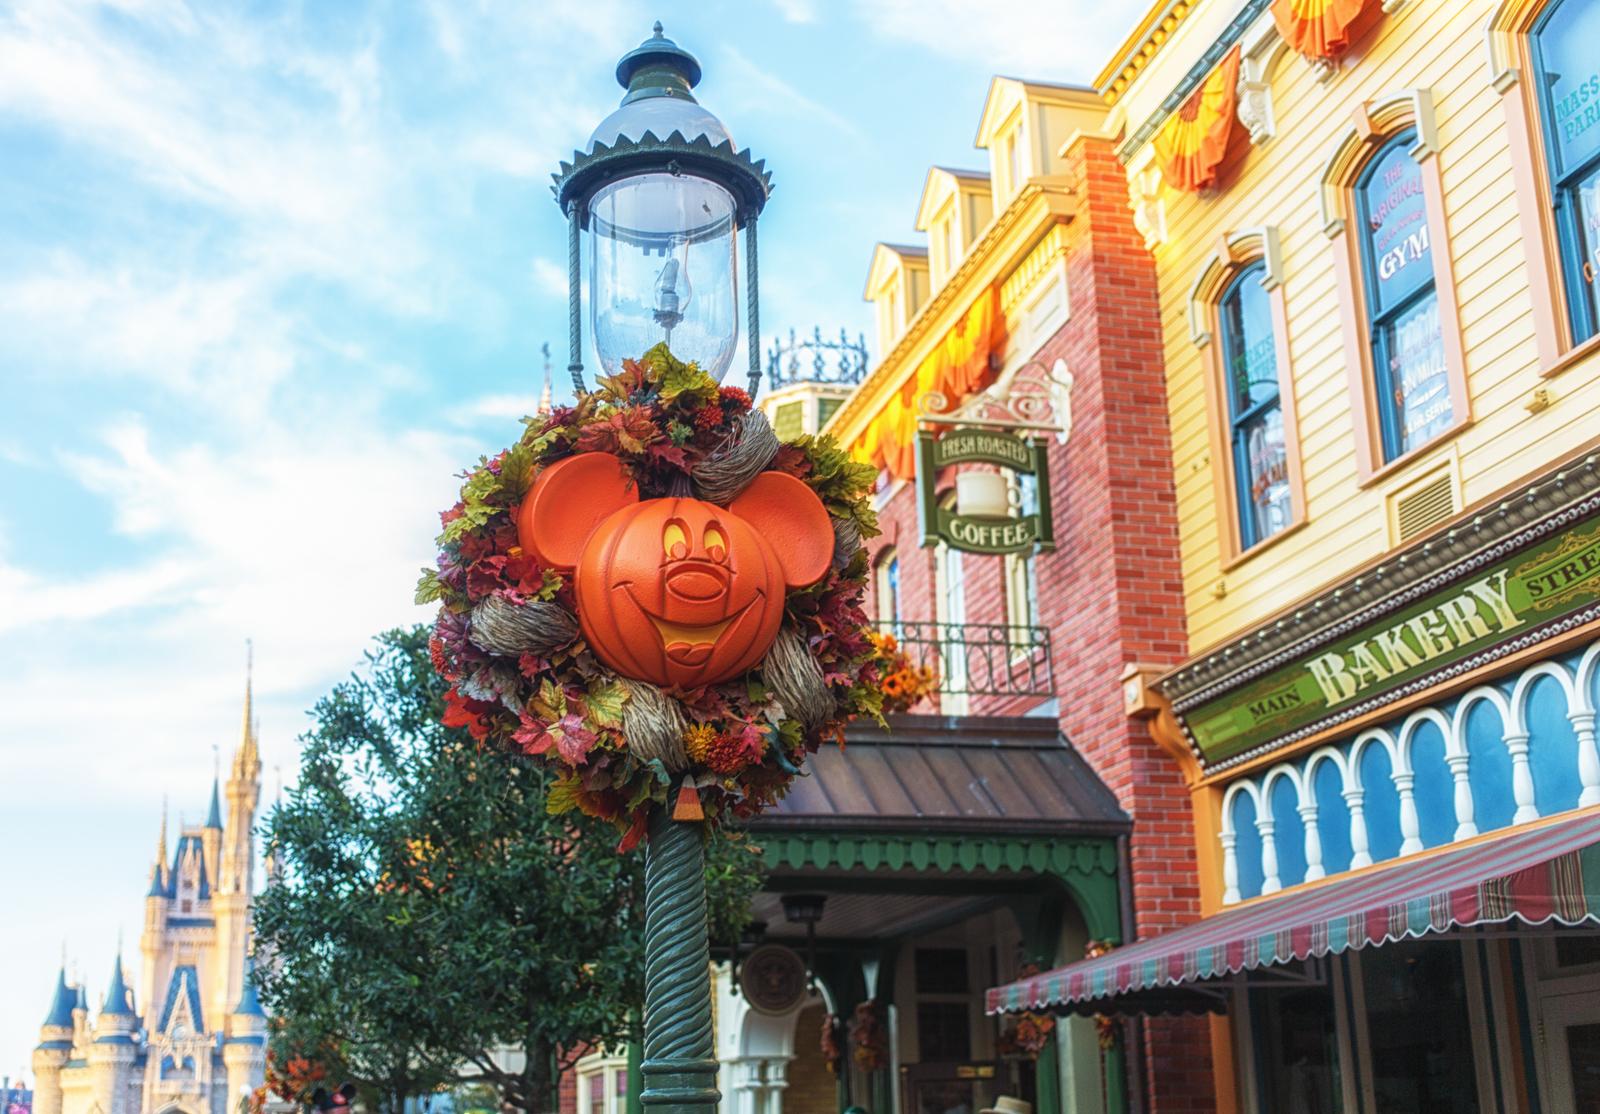 Disney's Not so Scary Halloween Party